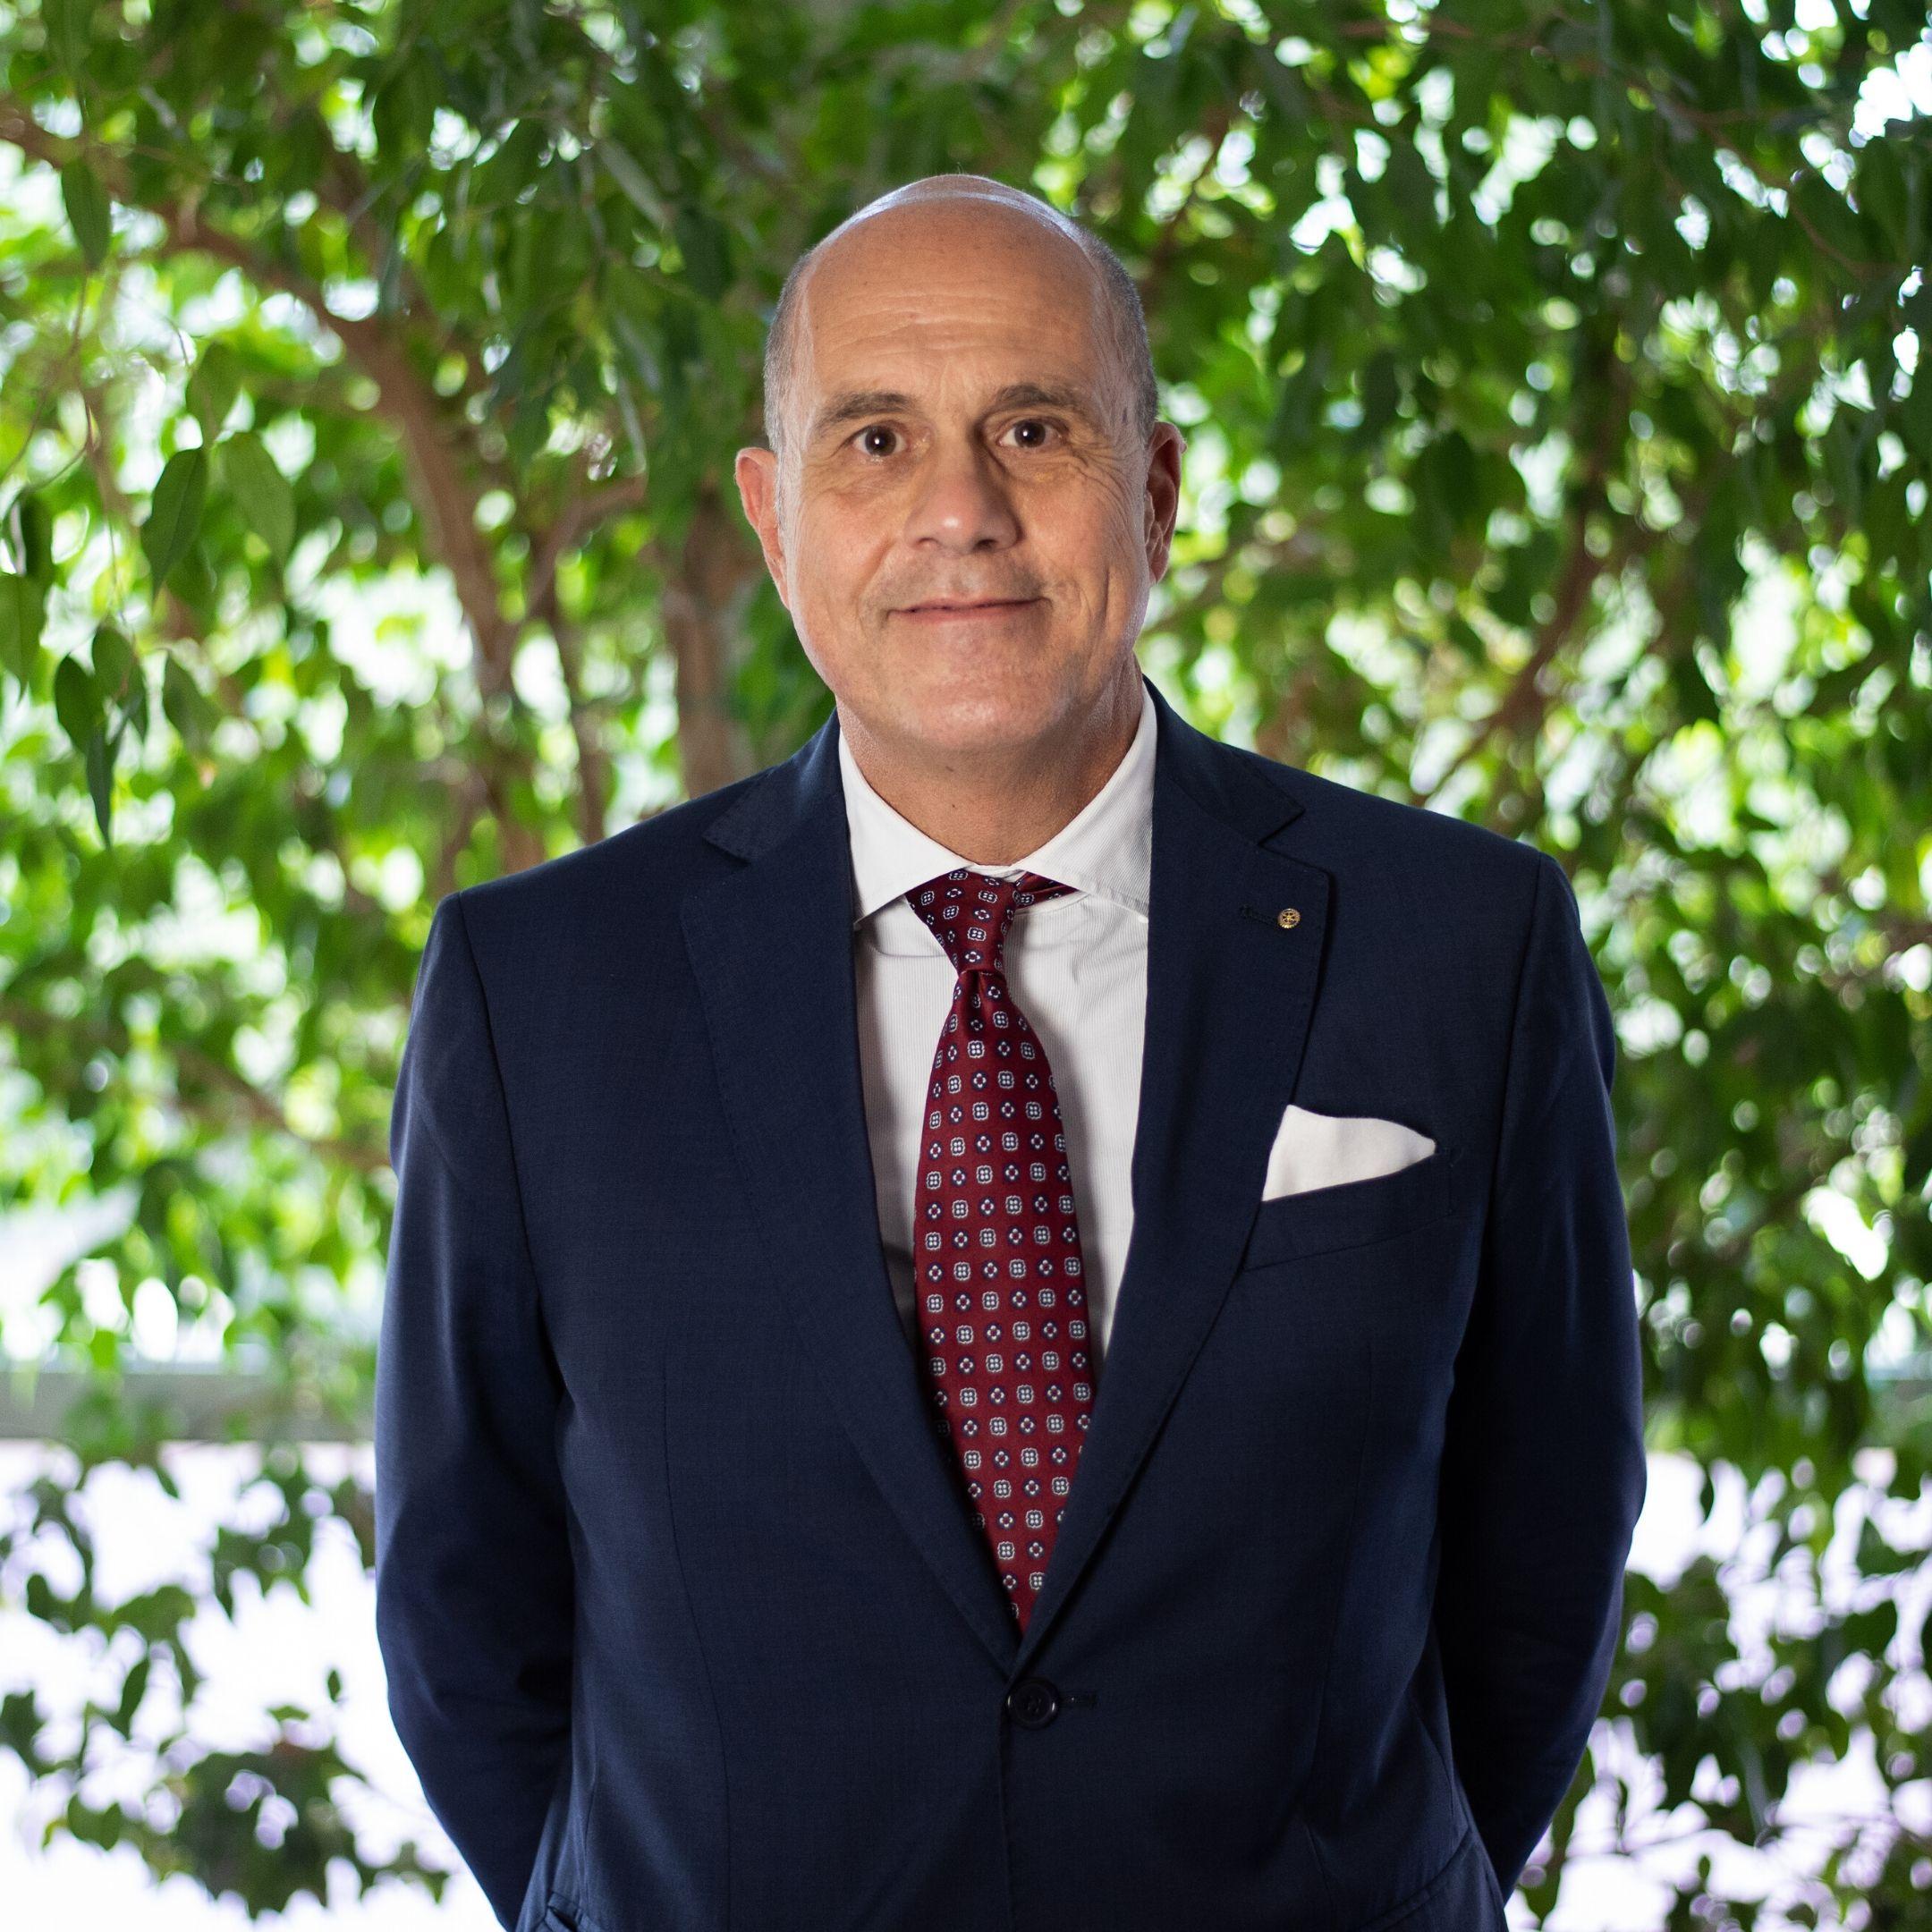 Dott. Paolo Ribetto